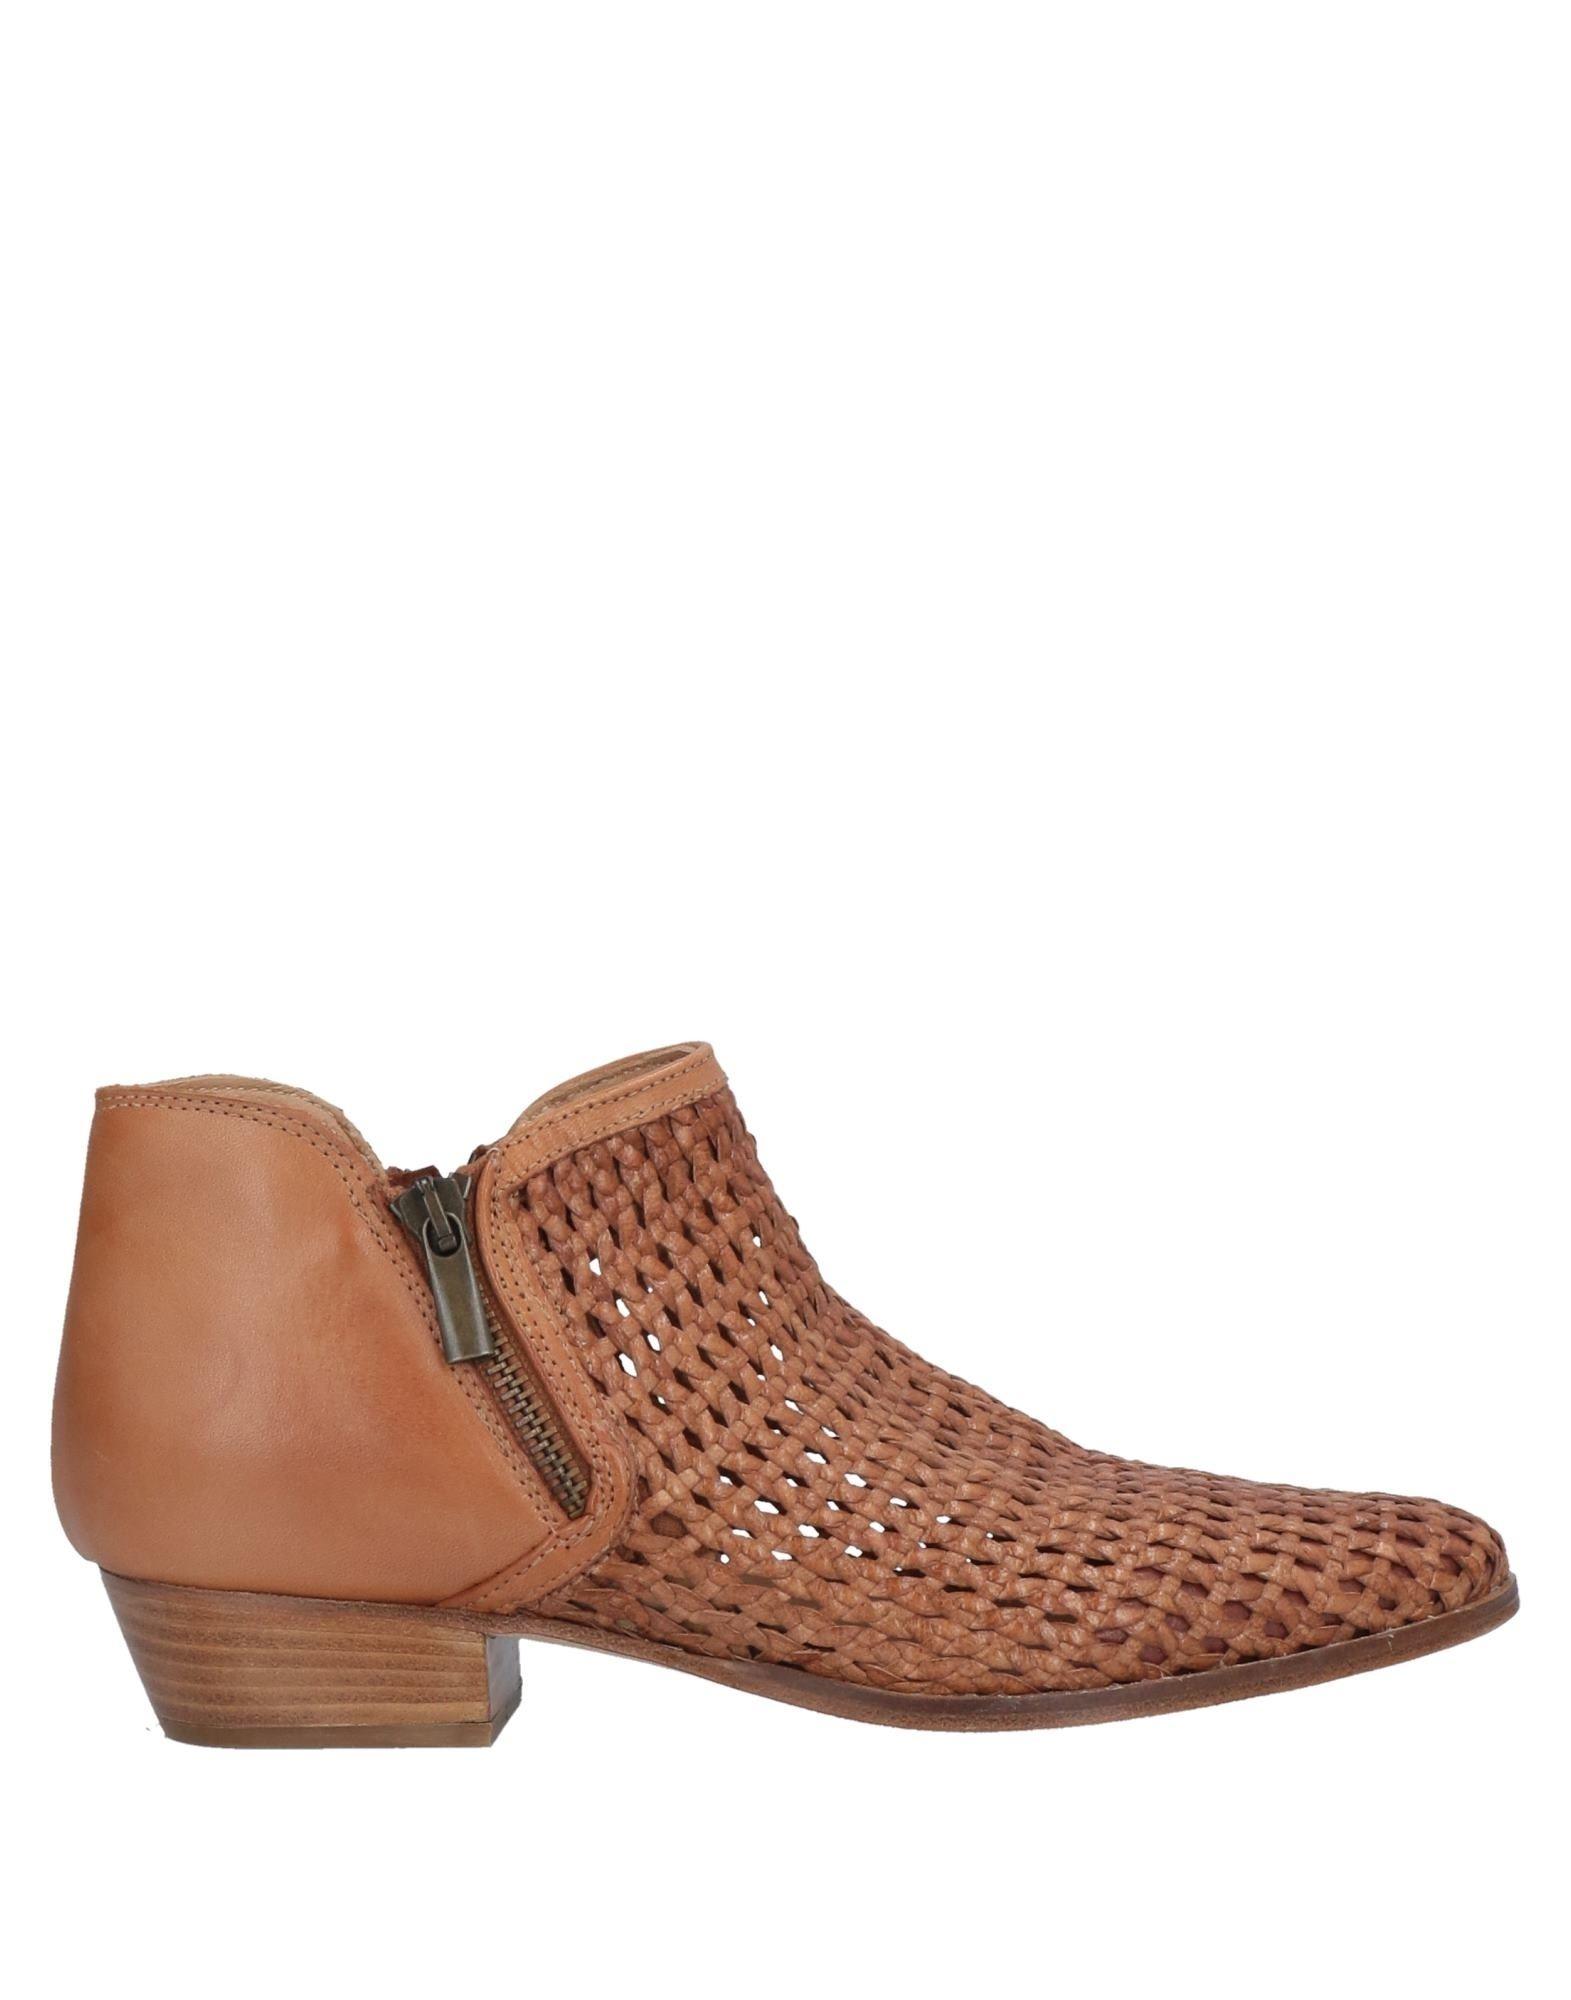 Фото - FRANCESCO MINICHINO Полусапоги и высокие ботинки francesco milano полусапоги и высокие ботинки